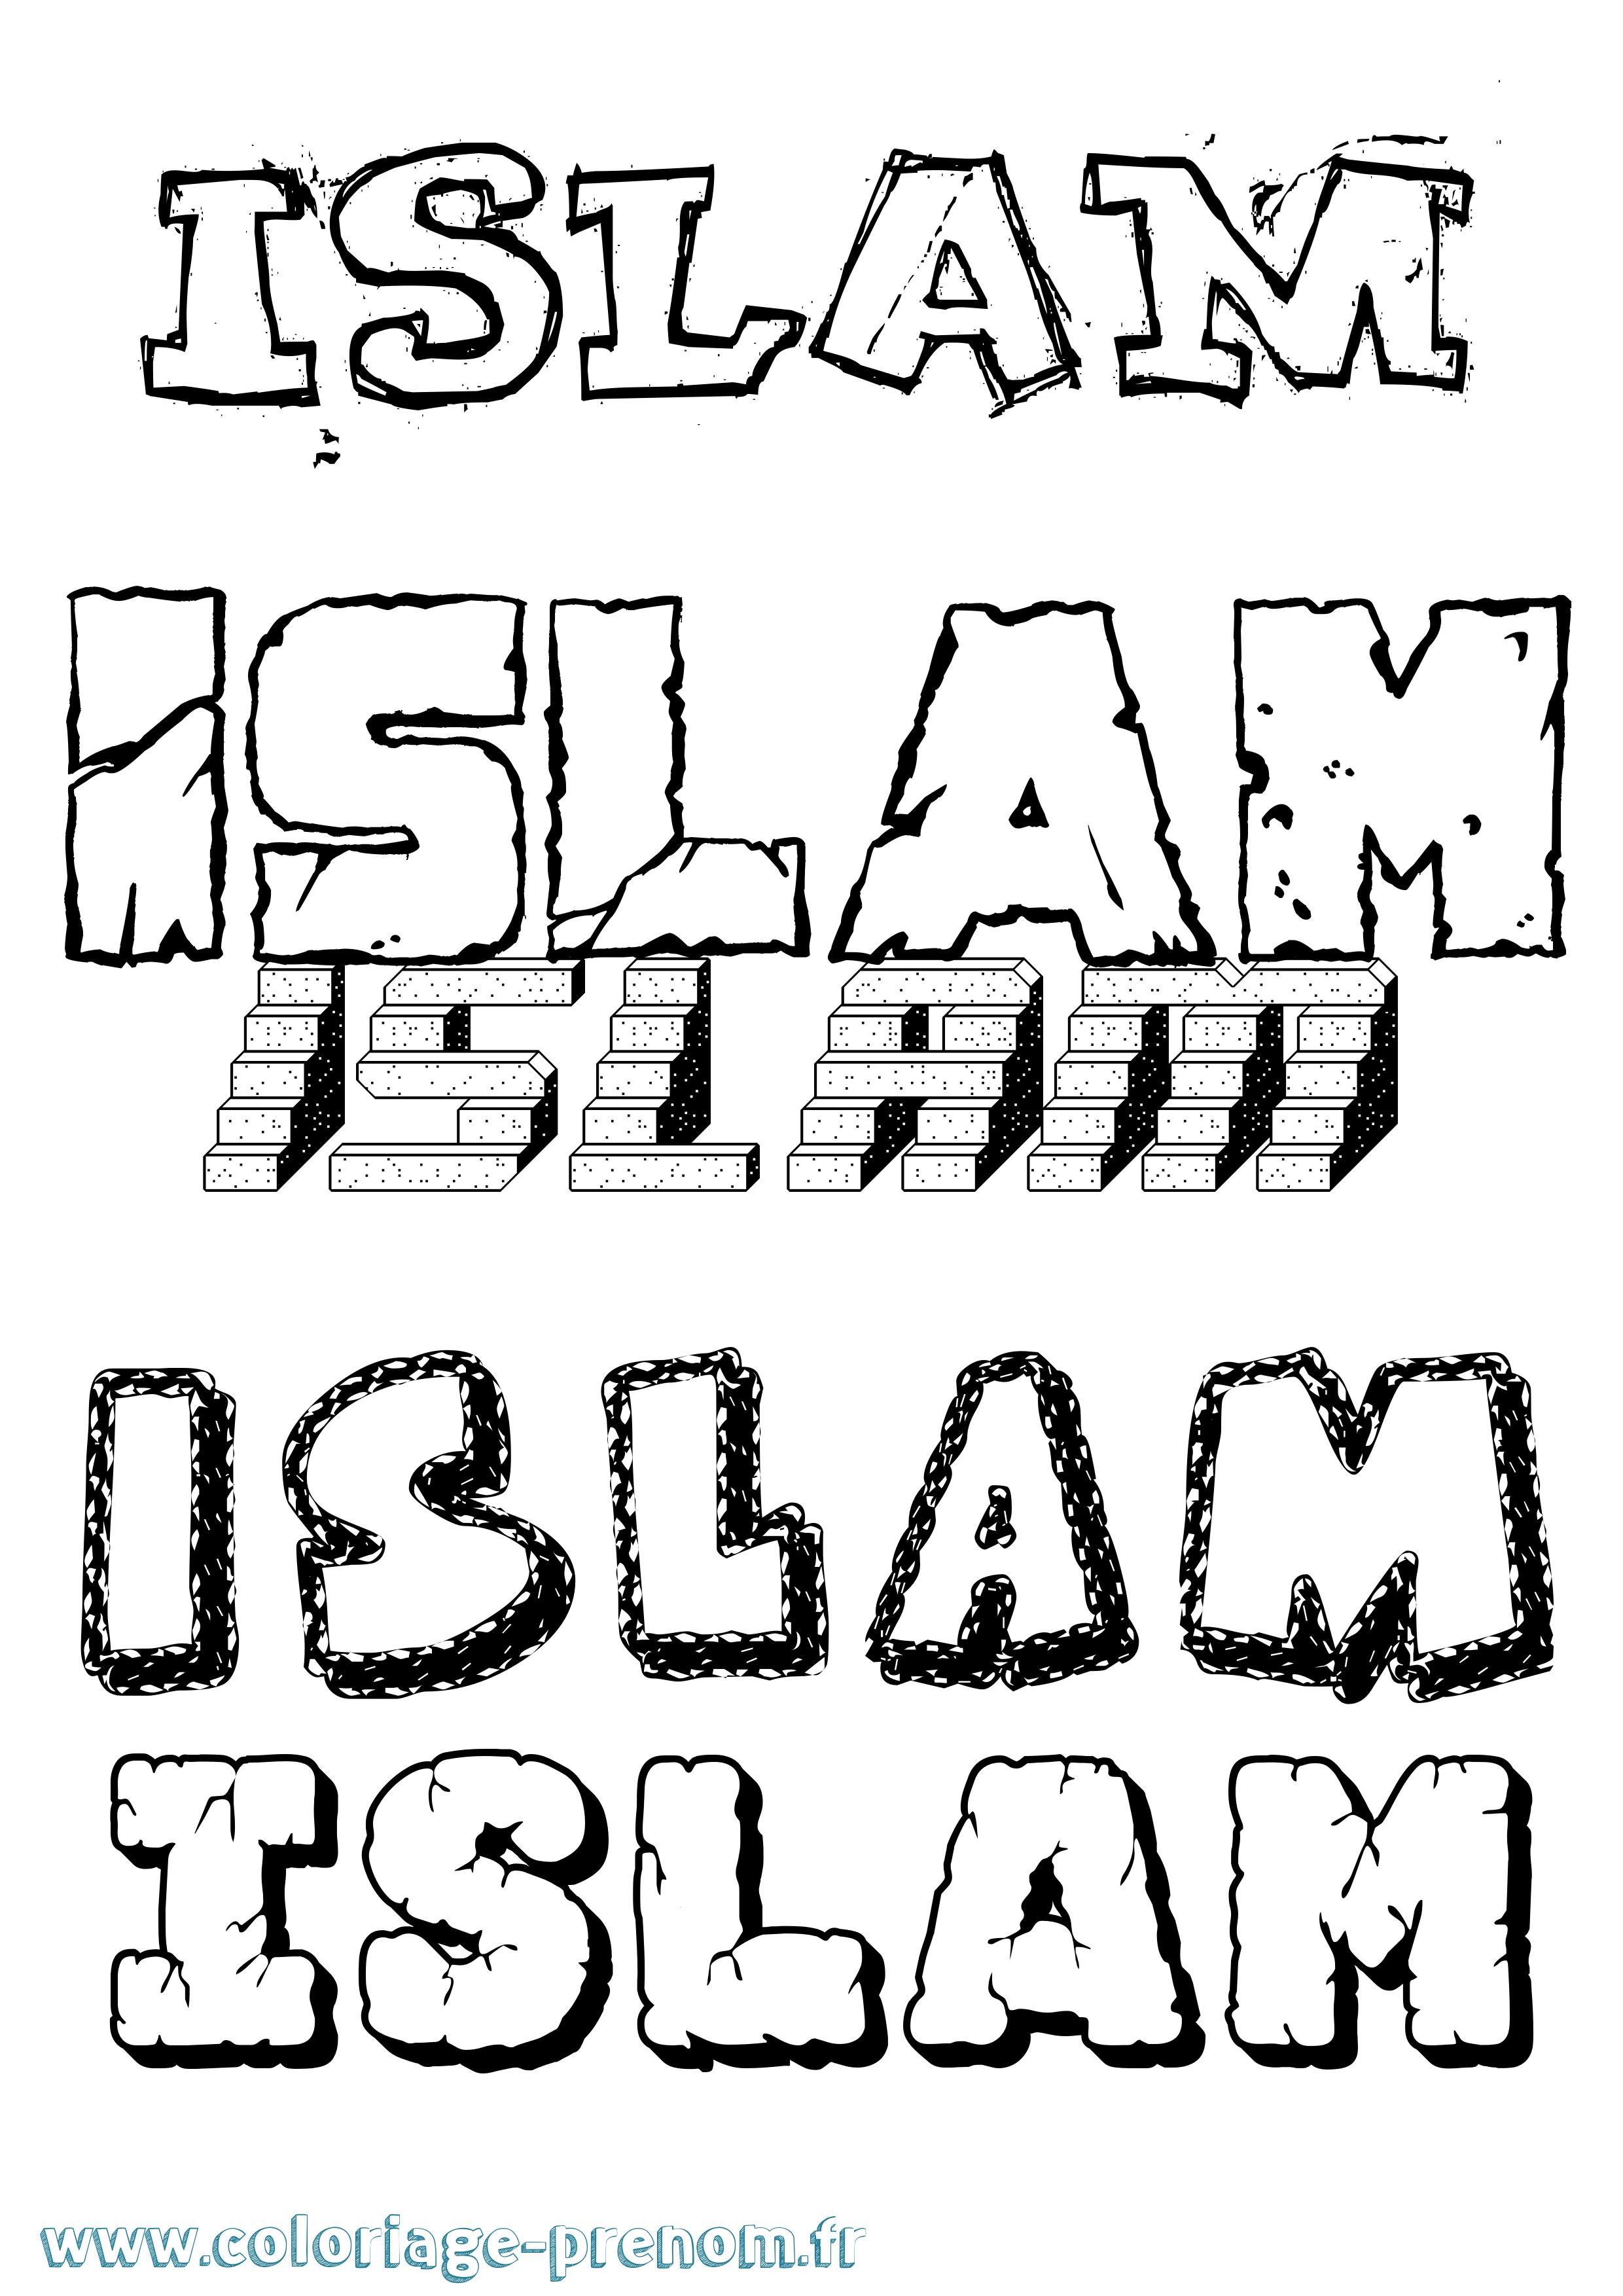 Coloriage Islam.Coloriage Du Prenom Islam A Imprimer Ou Telecharger Facilement